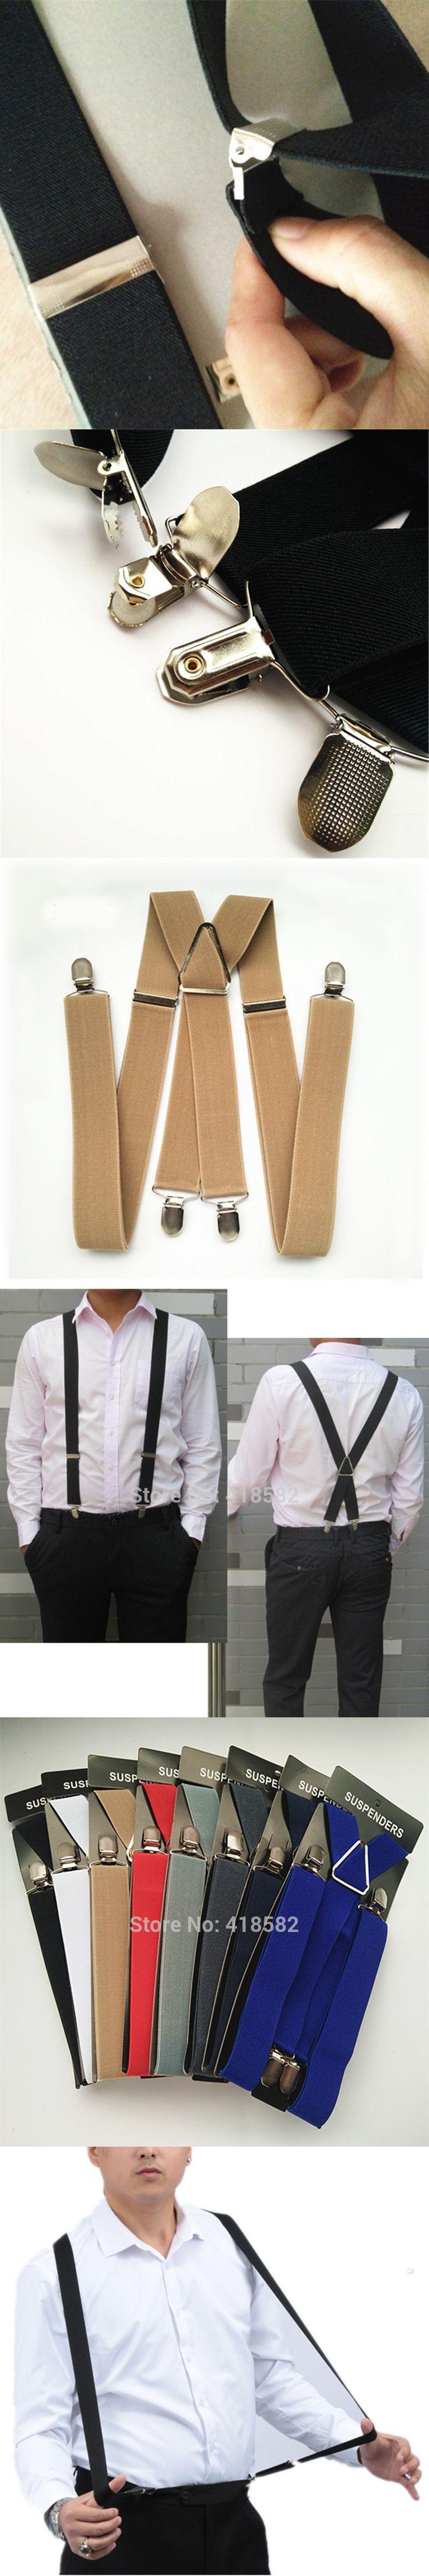 BD054-L XL size 2017 new tan color 3.5 width 4 clips Adult suspenders adjustable elastic X back pants Braces suspender for men